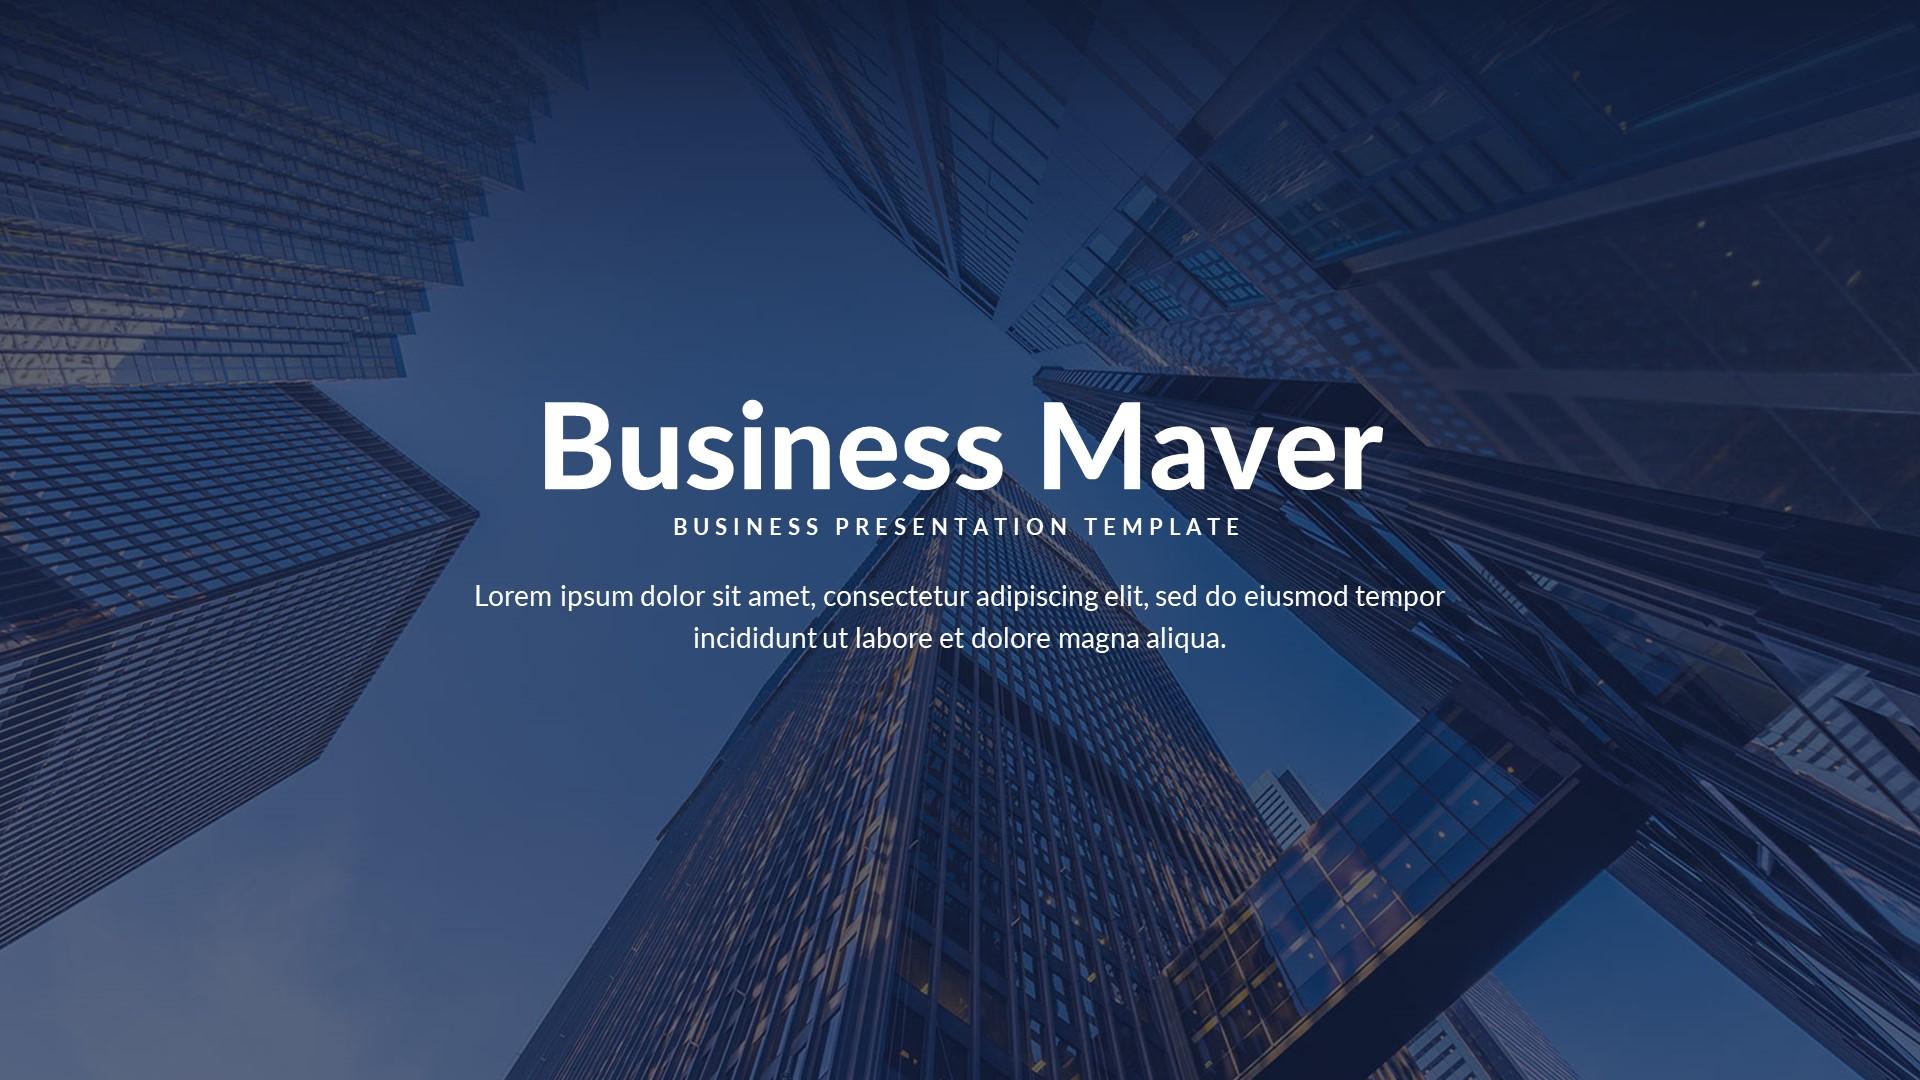 Business Maver Google Slide Template